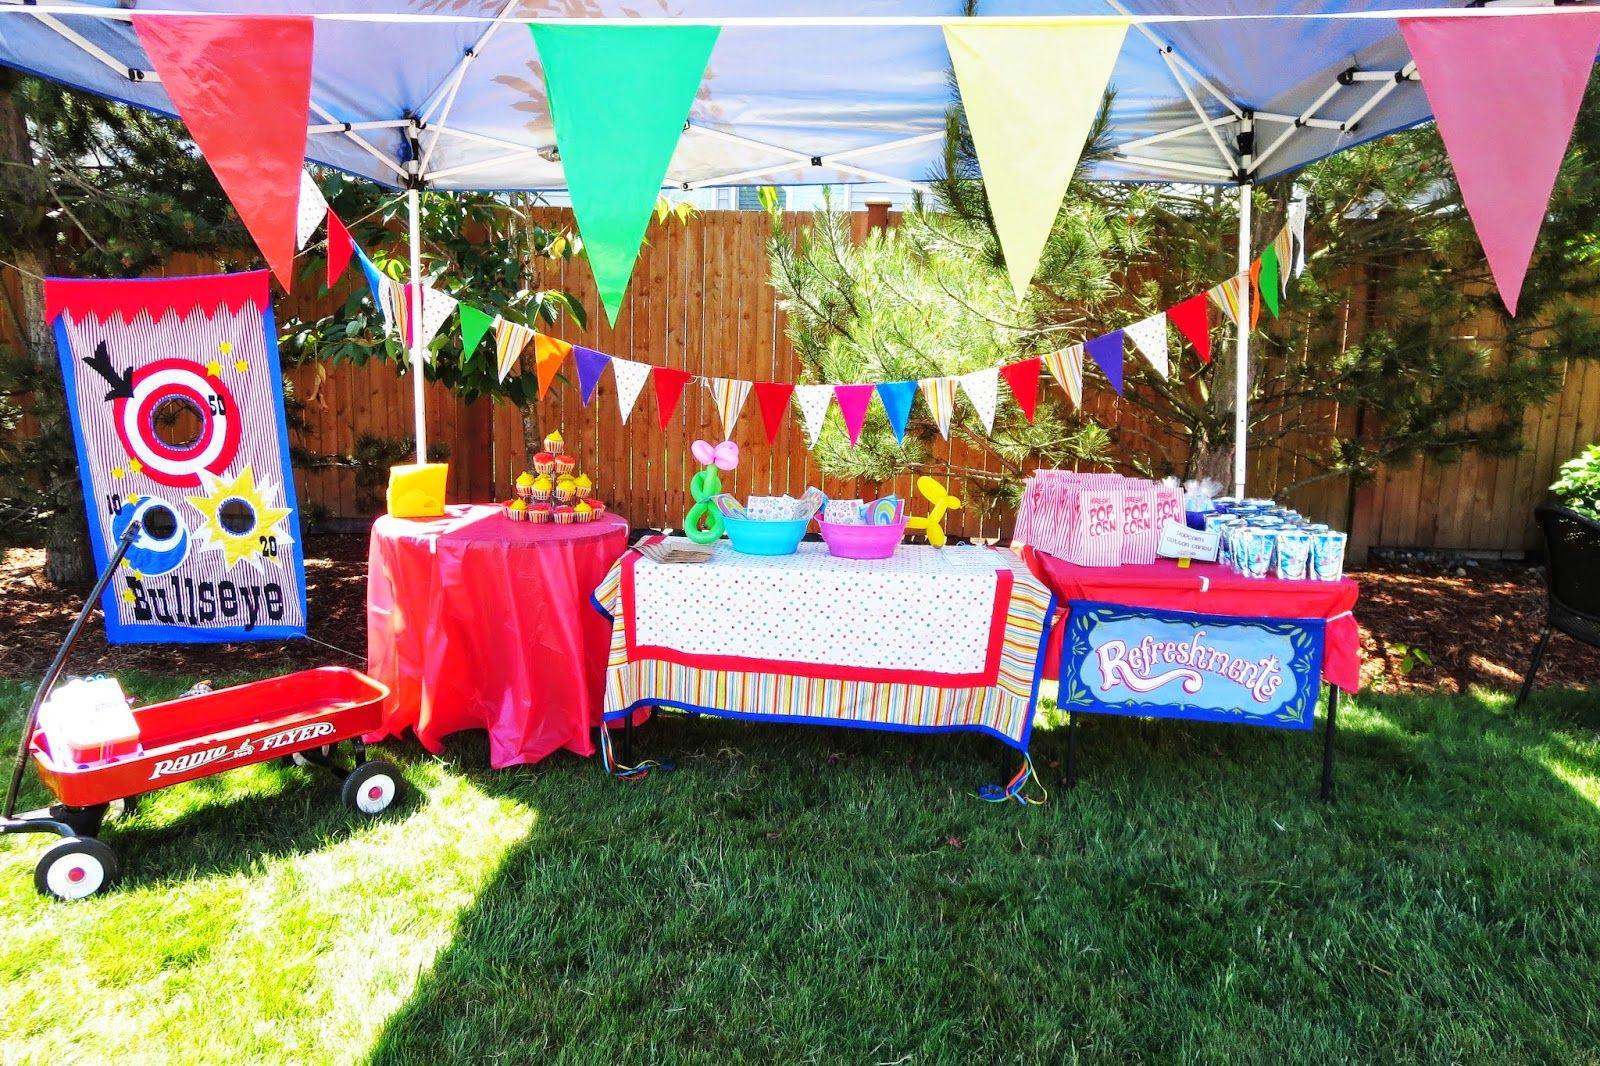 Backyard Carnival floor plan of a backyard carnival party - google search   kids